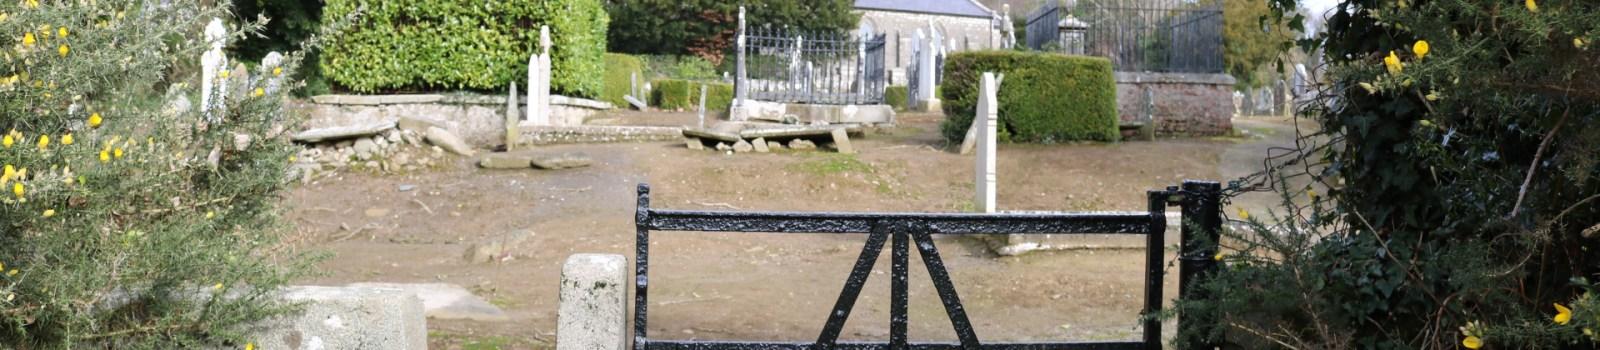 St. Anne's Graveyard, Killann